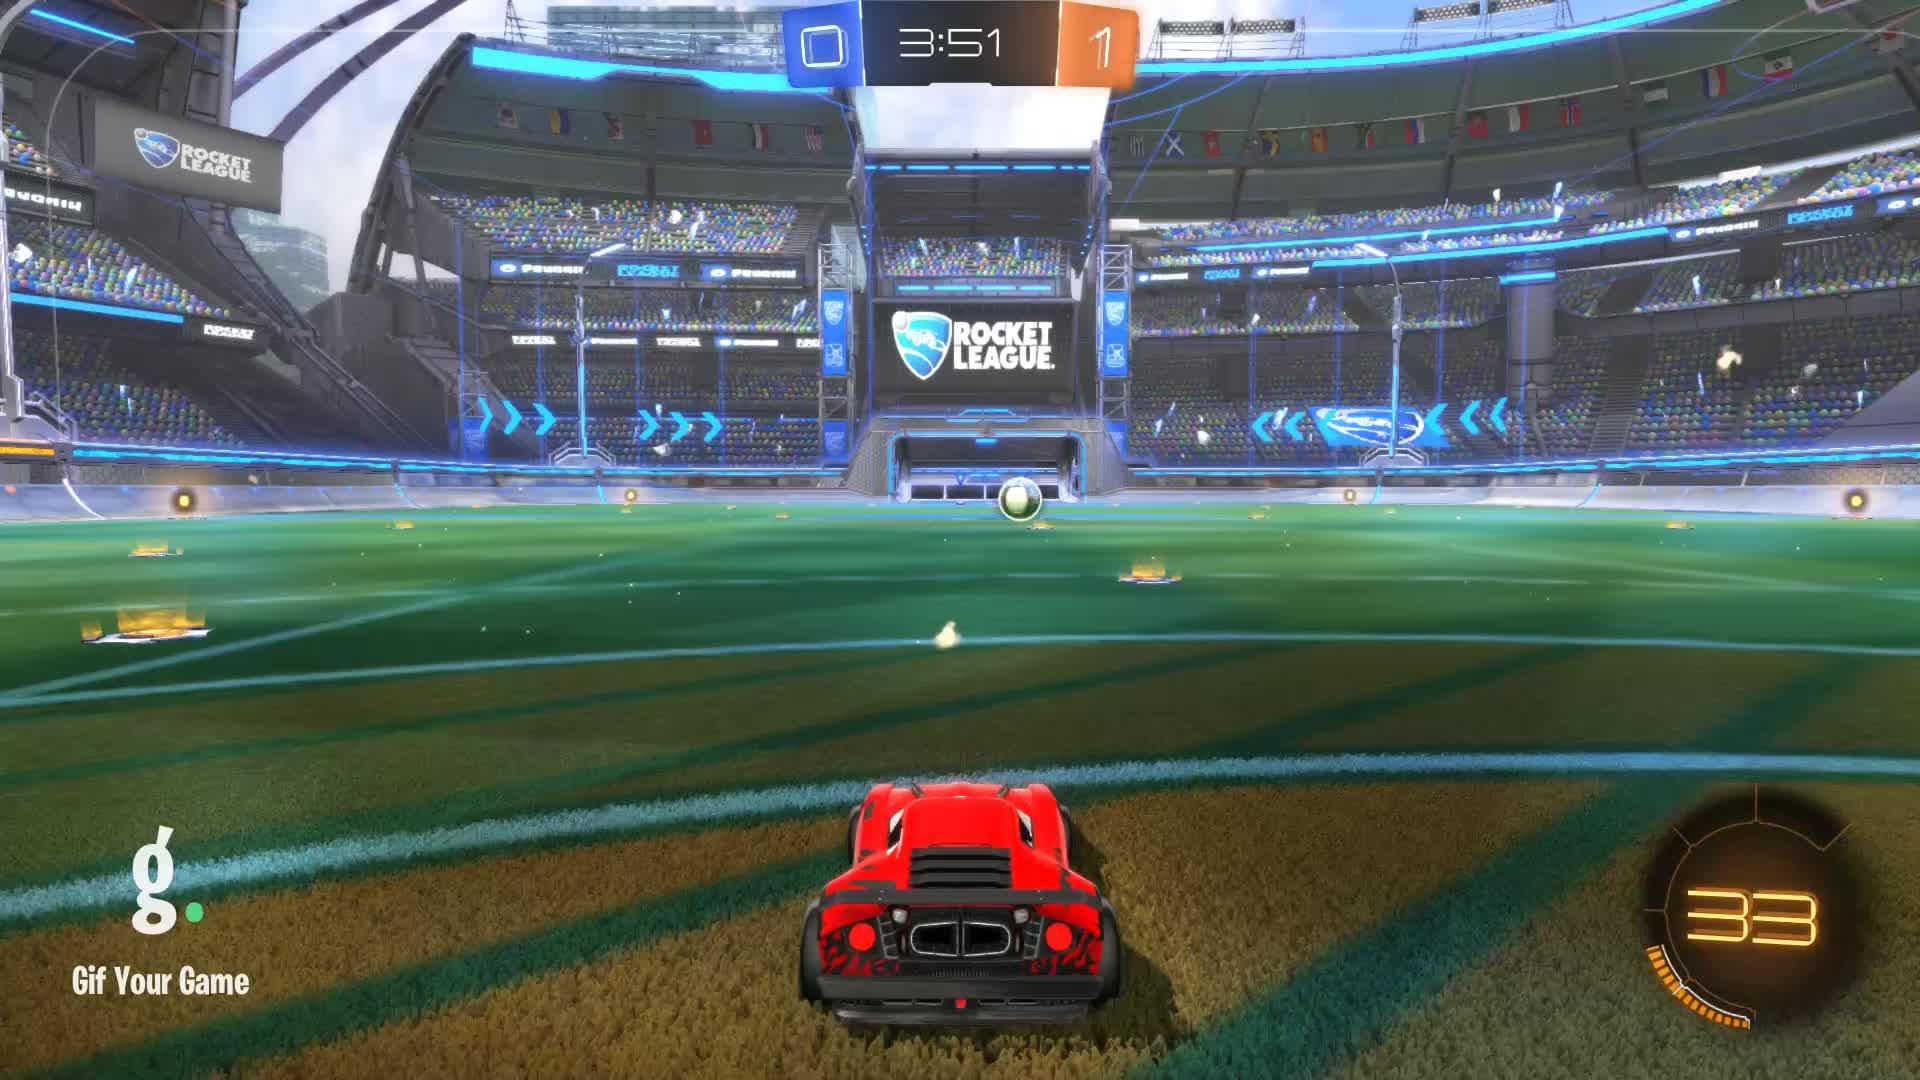 Gif Your Game, GifYourGame, Goal, Rocket League, RocketLeague, datboi, Goal 2: datboi GIFs